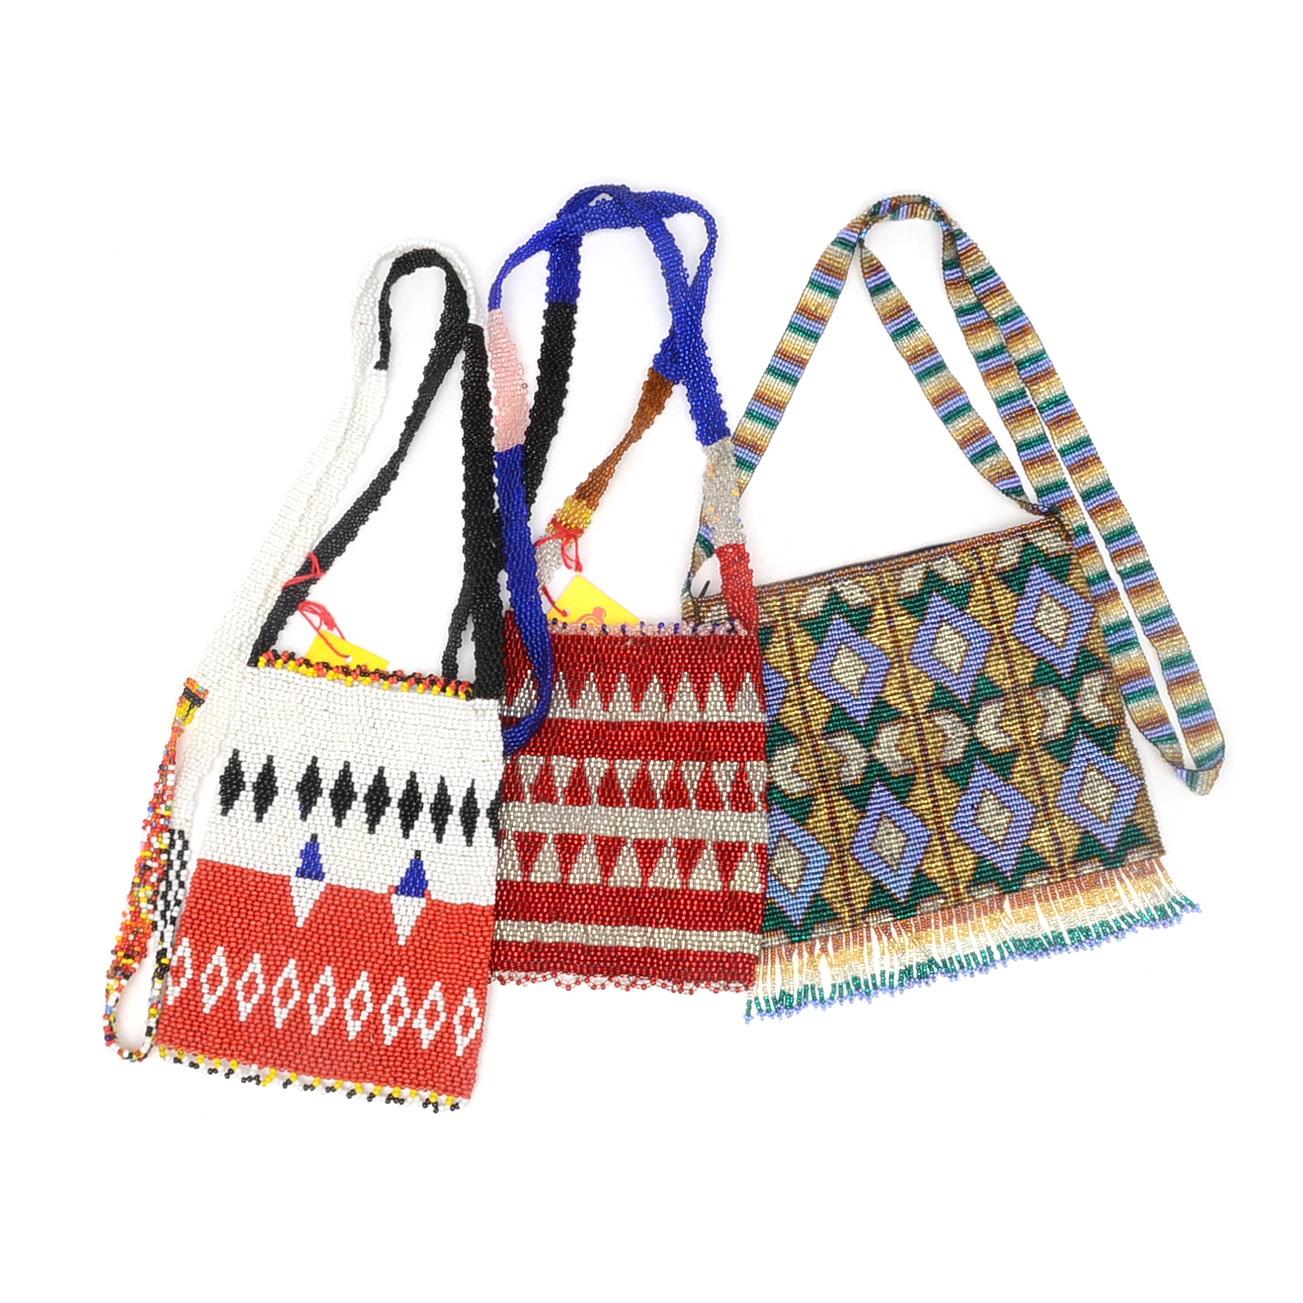 Collection of Hand Beaded Handbags